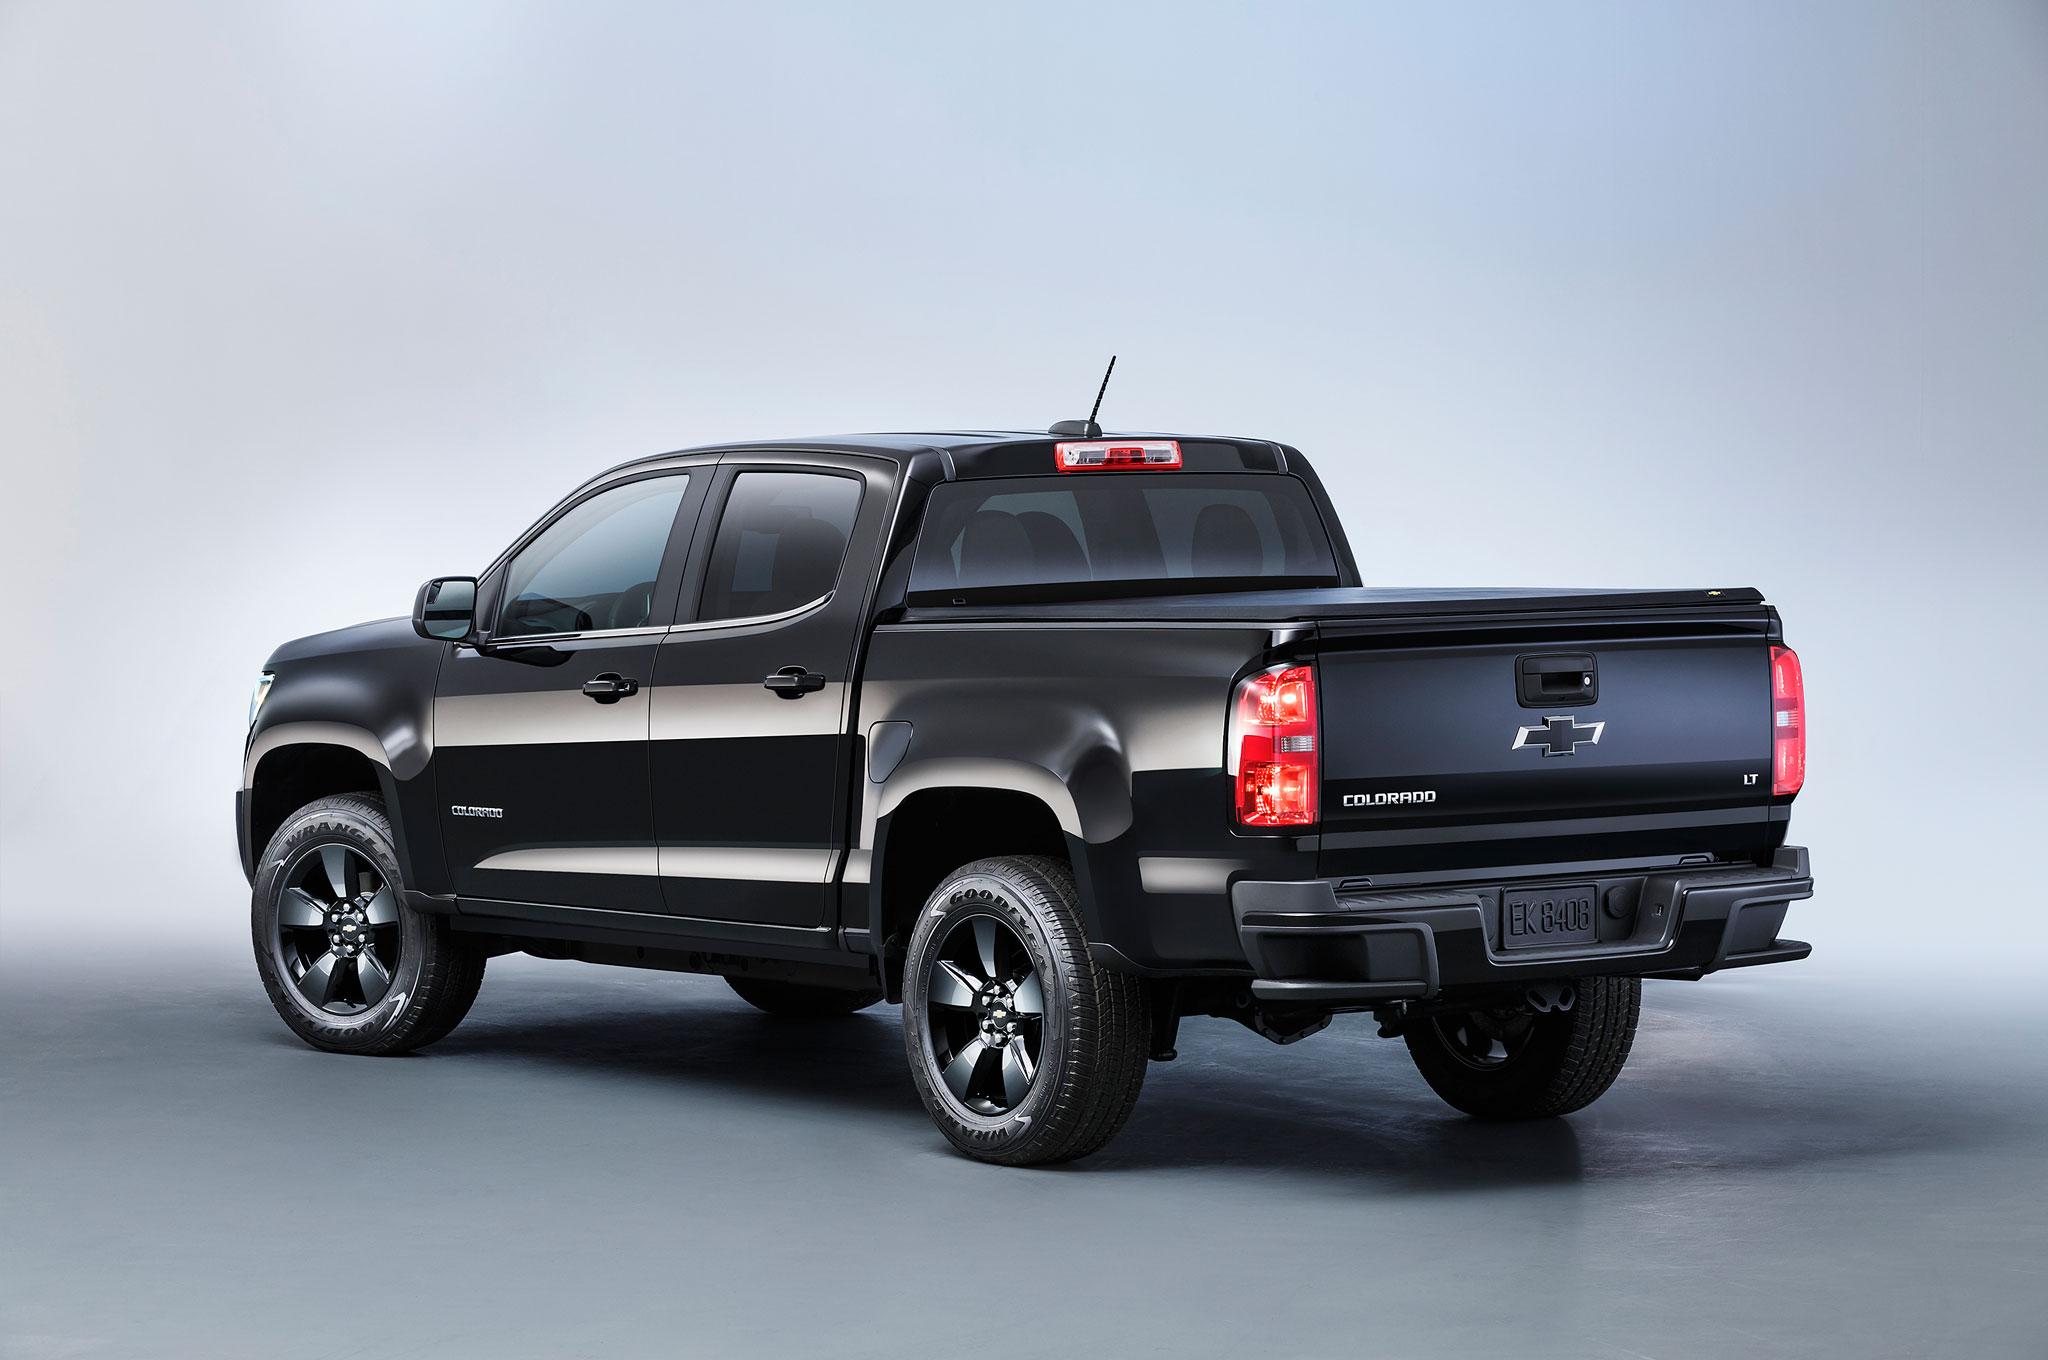 2016 Chevrolet Colorado Diesel Review 04 Wiring Diagram Show More